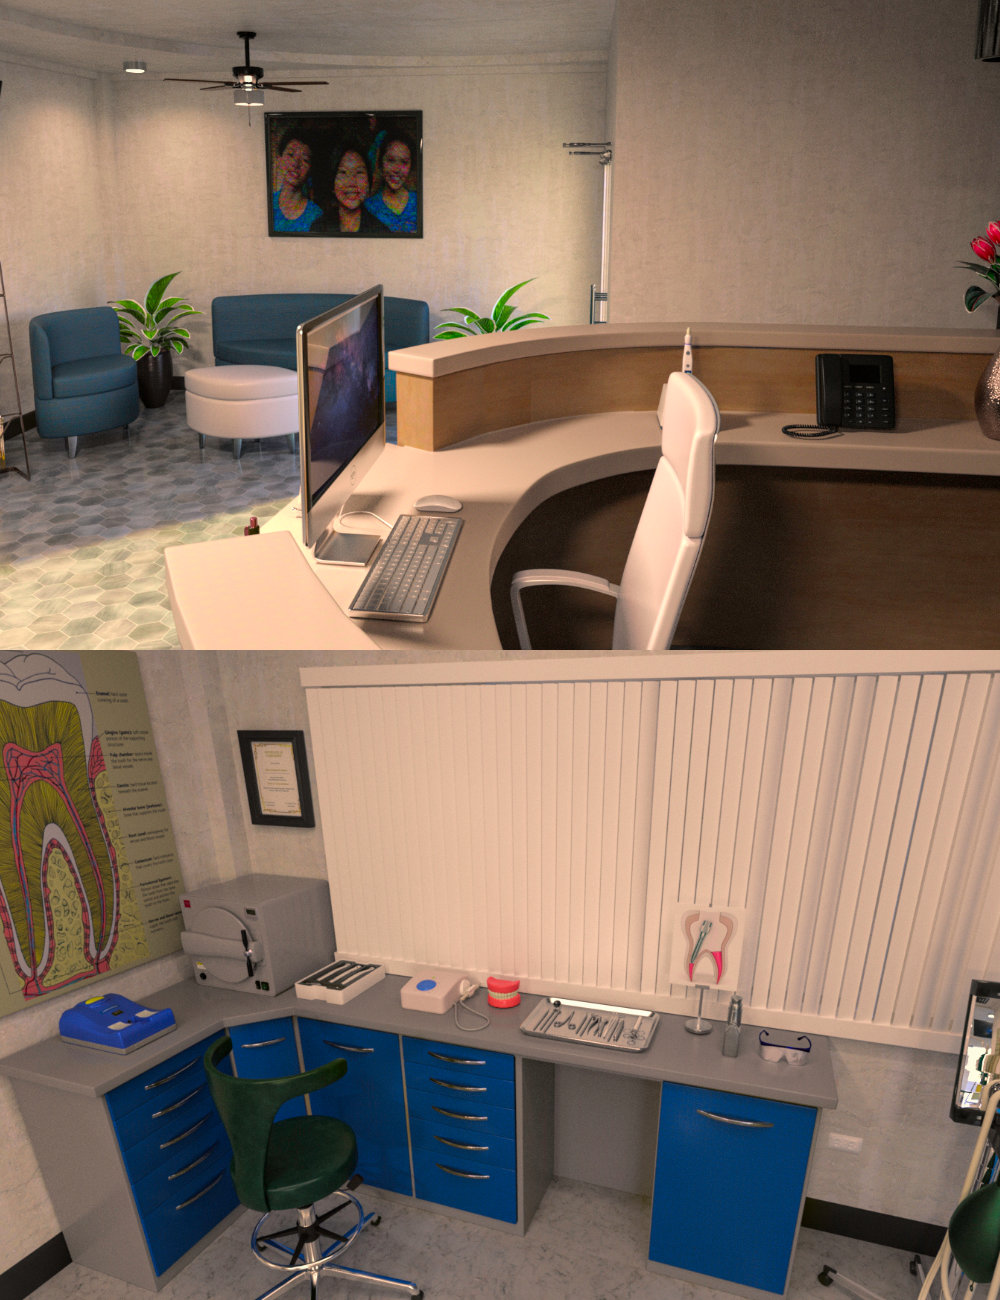 FG Dentist Office by: PAN StudiosFugazi1968Ironman, 3D Models by Daz 3D